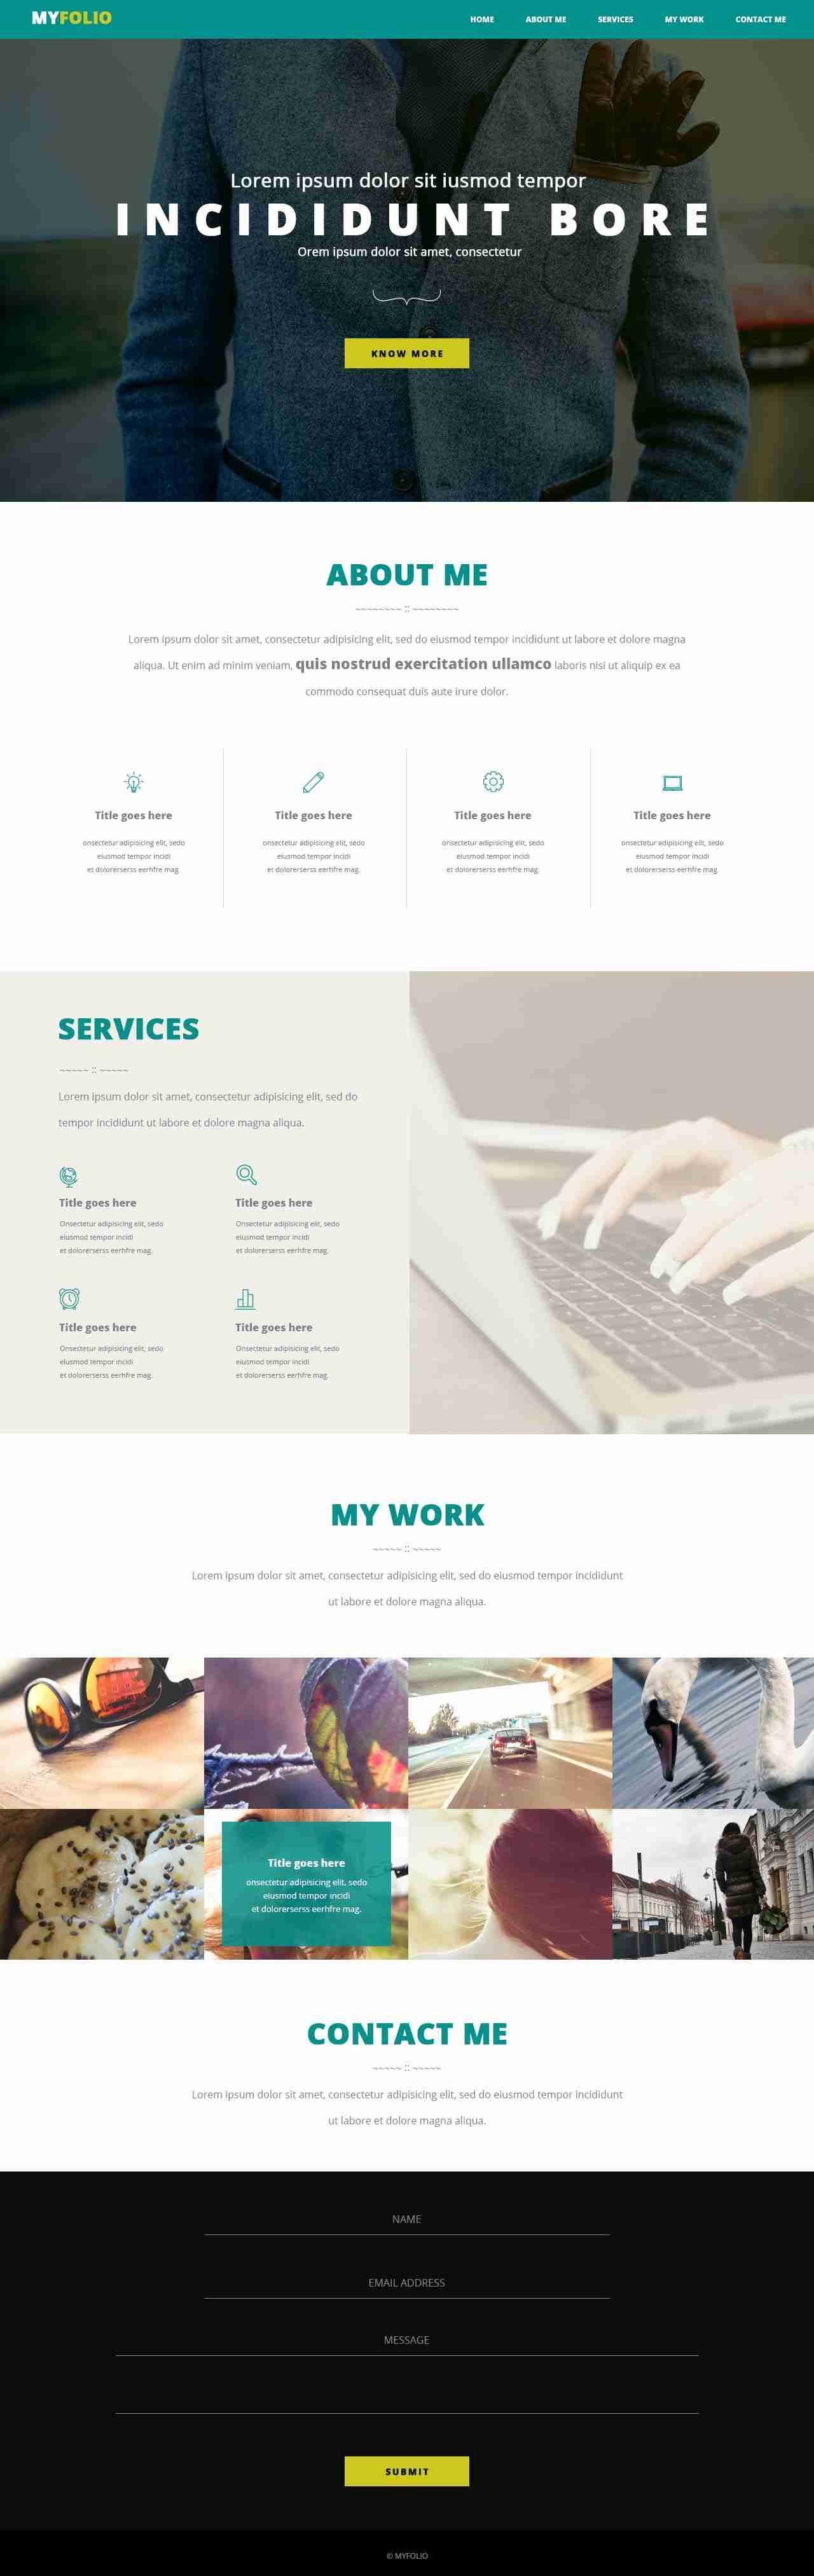 Web Design PSD To HTML Convert